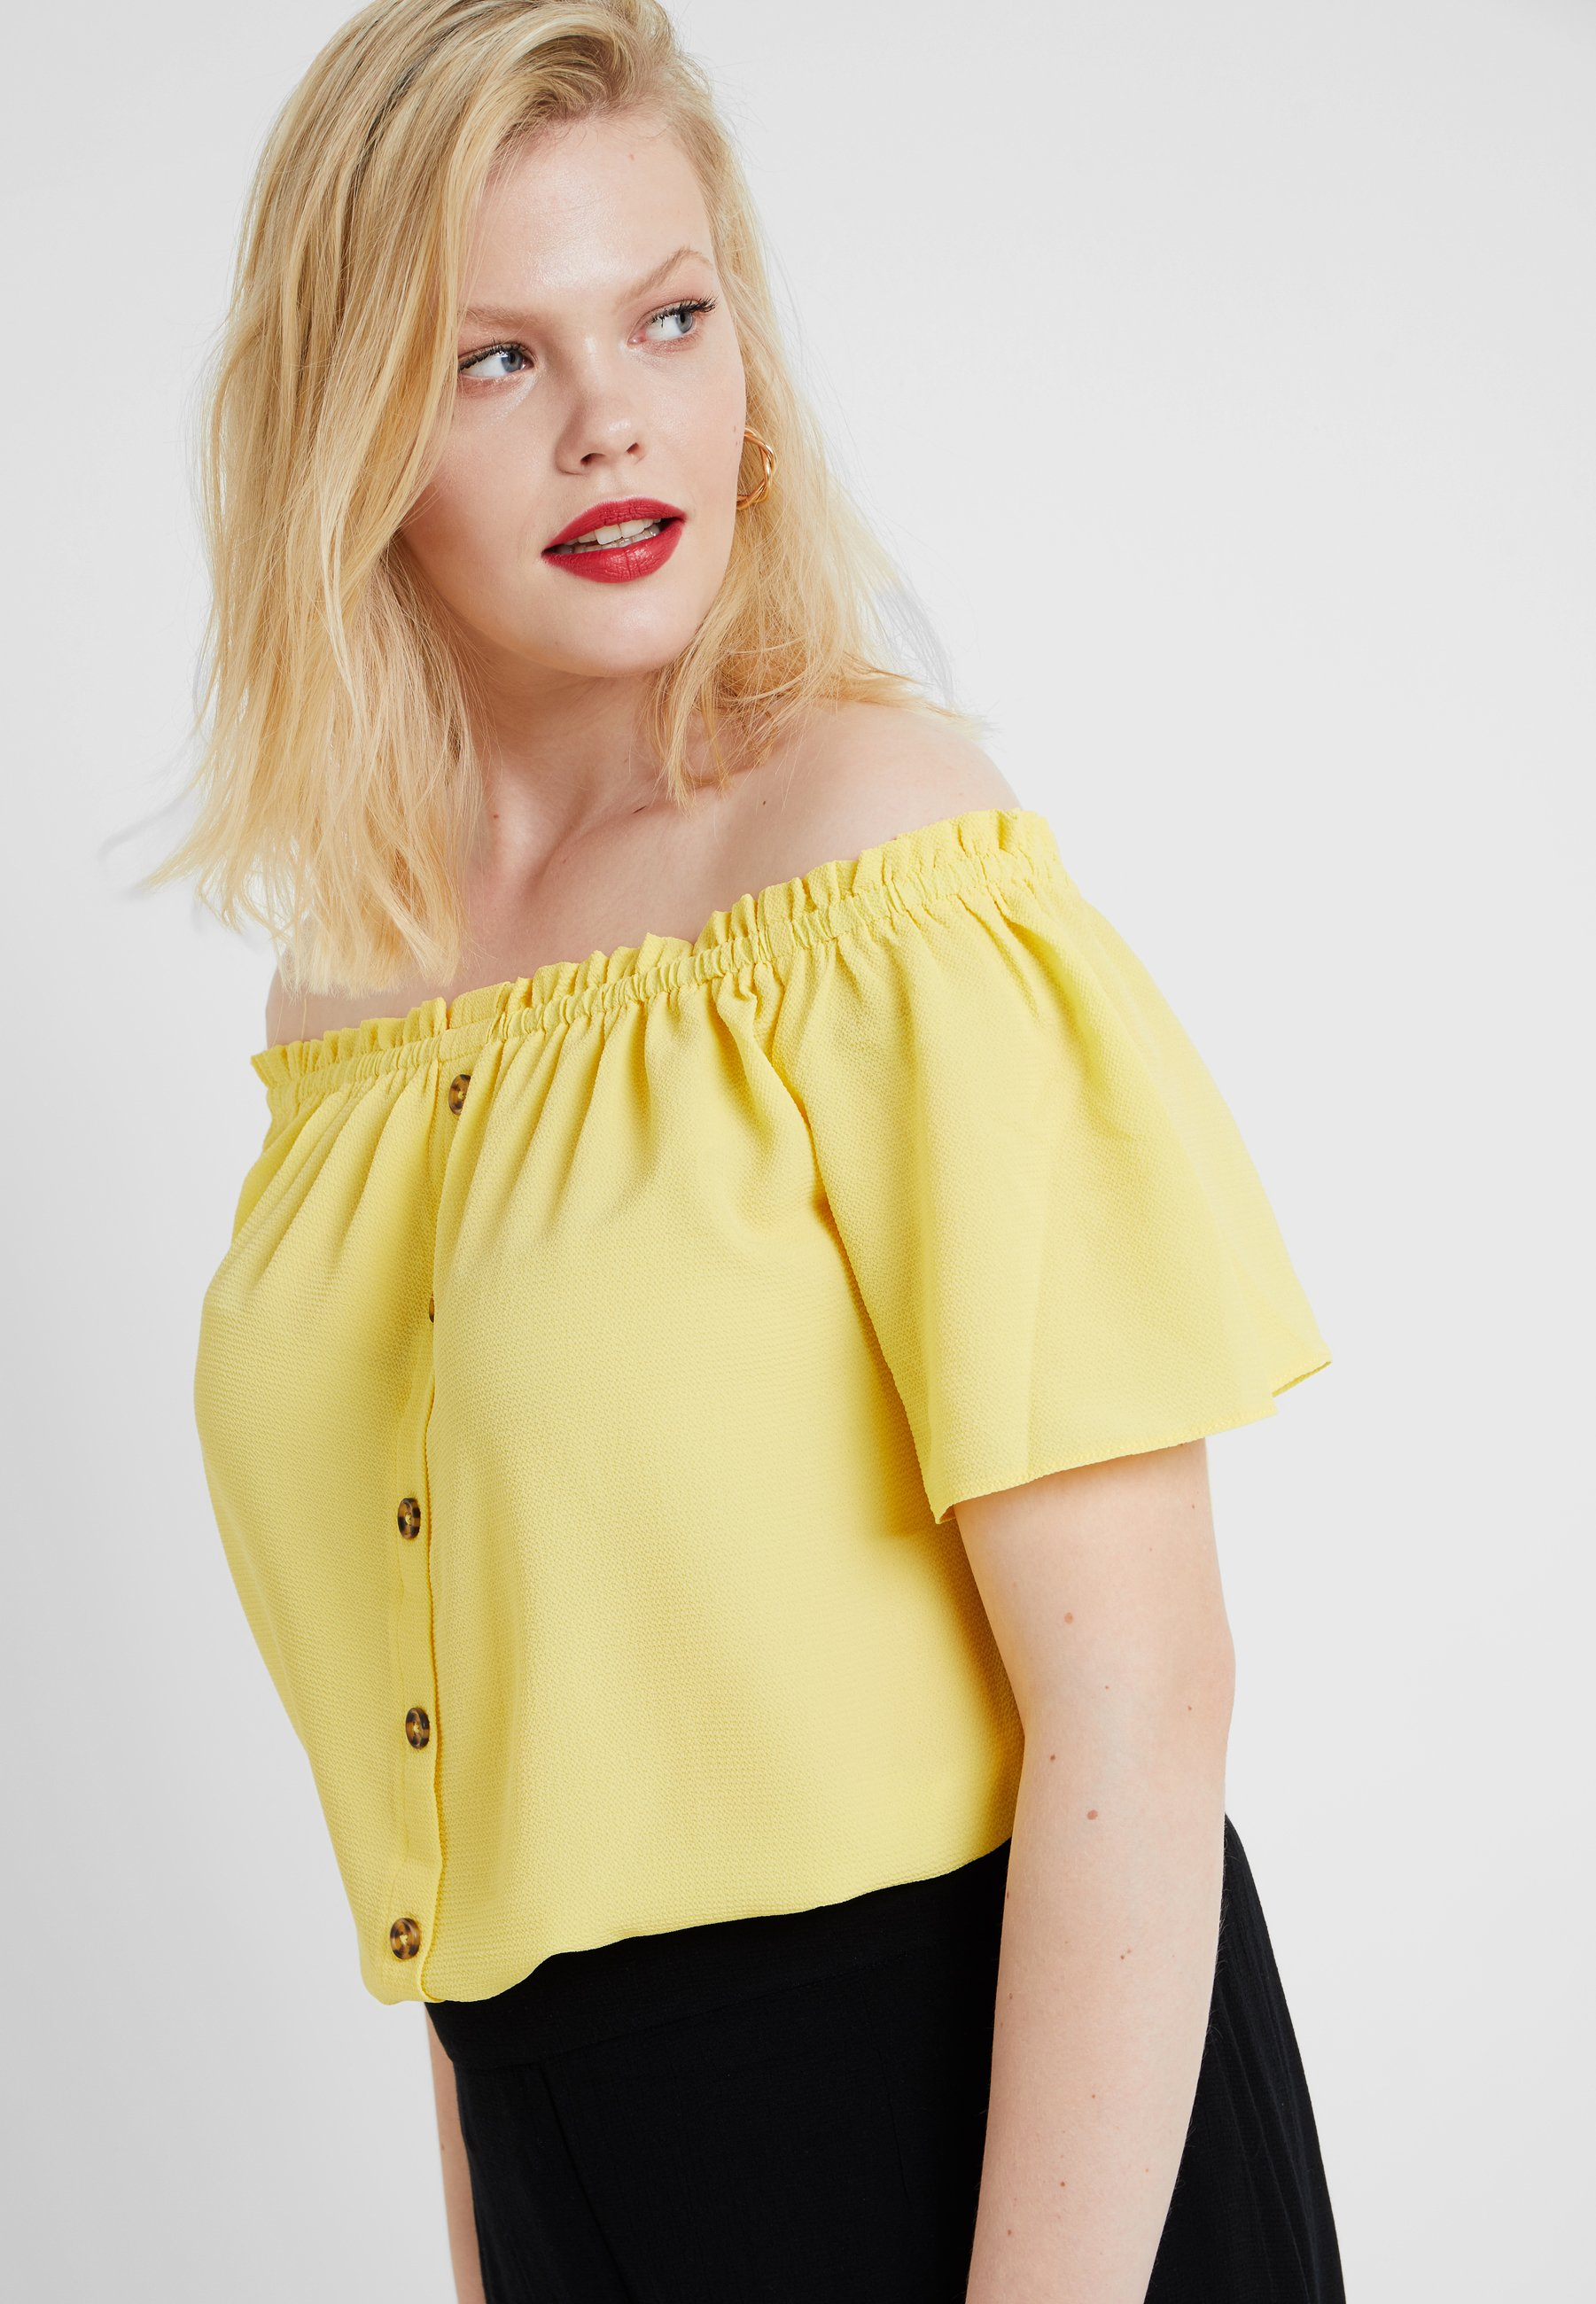 Perkins Lemon Down Curve Button BardotBlouse Dorothy MzpVSU